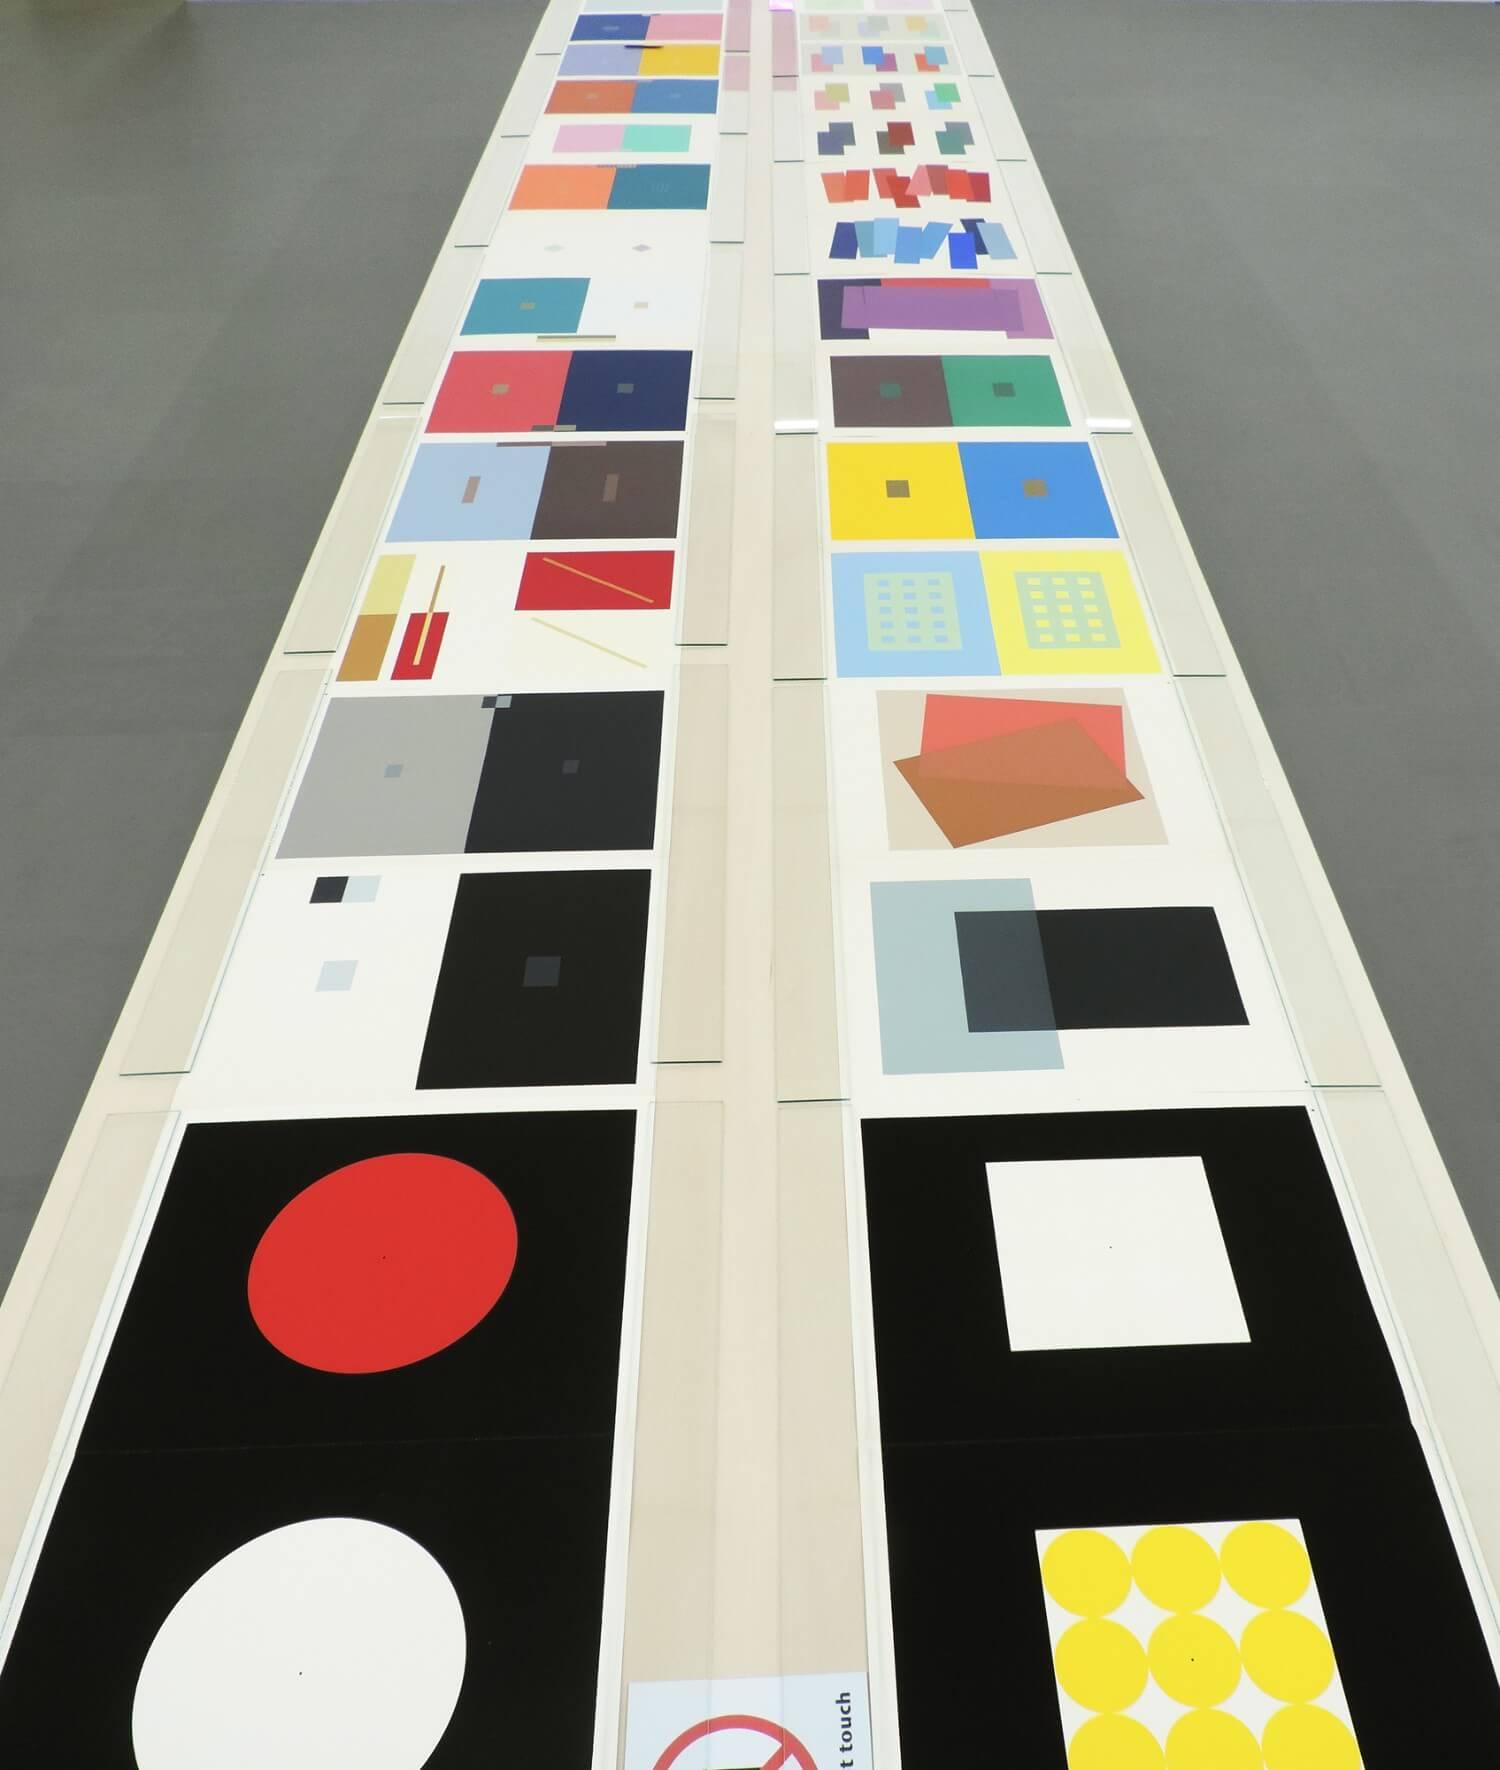 Josef Albers<br>interaction of color80 / silkscreens, 33 x 25.5 cm, 1963ケースサイズ, 37 x 28 x 14.5 cm